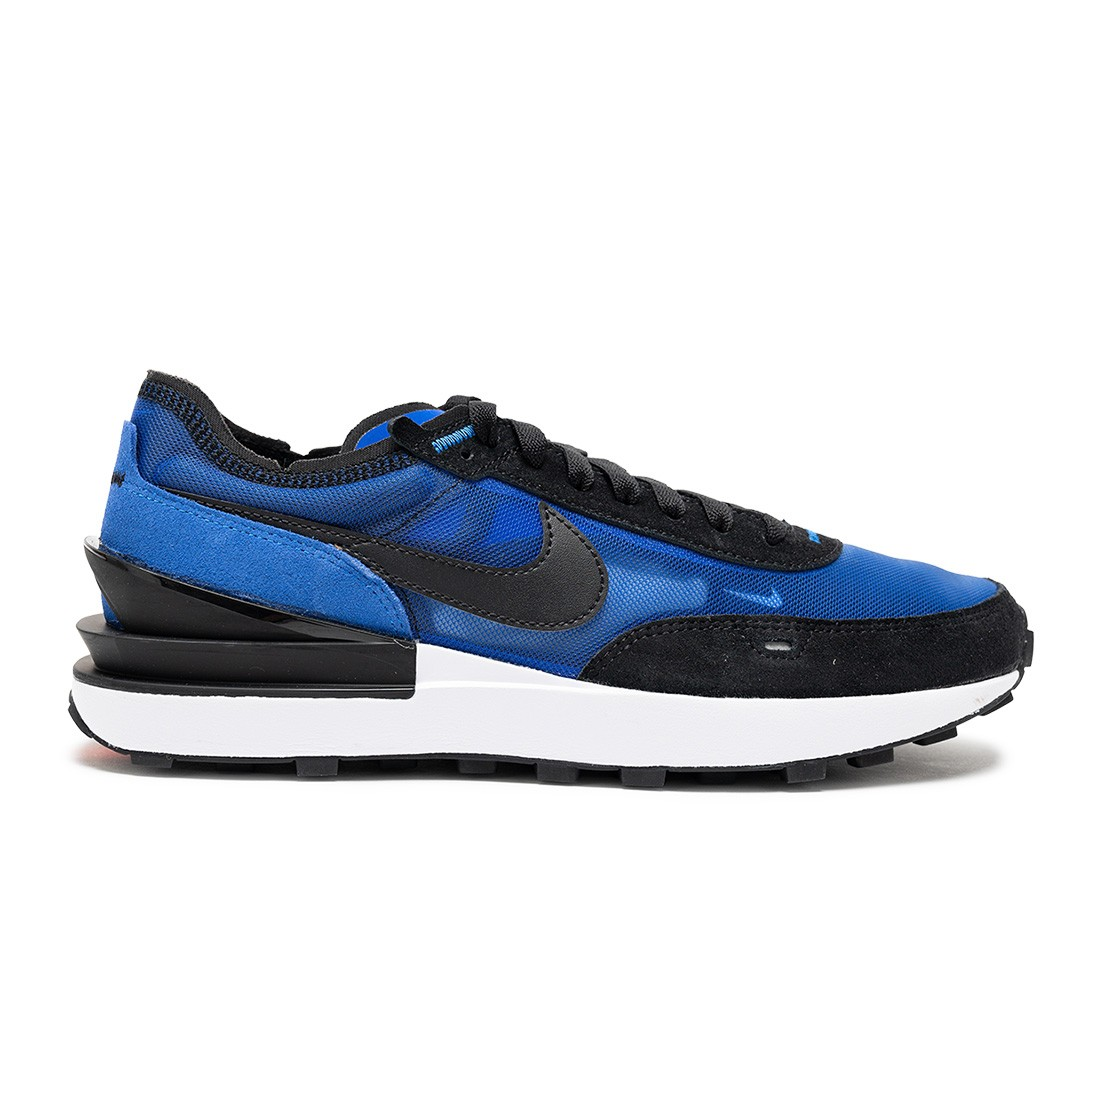 Nike Men Waffle One (racer blue / black-white-bright crimson)